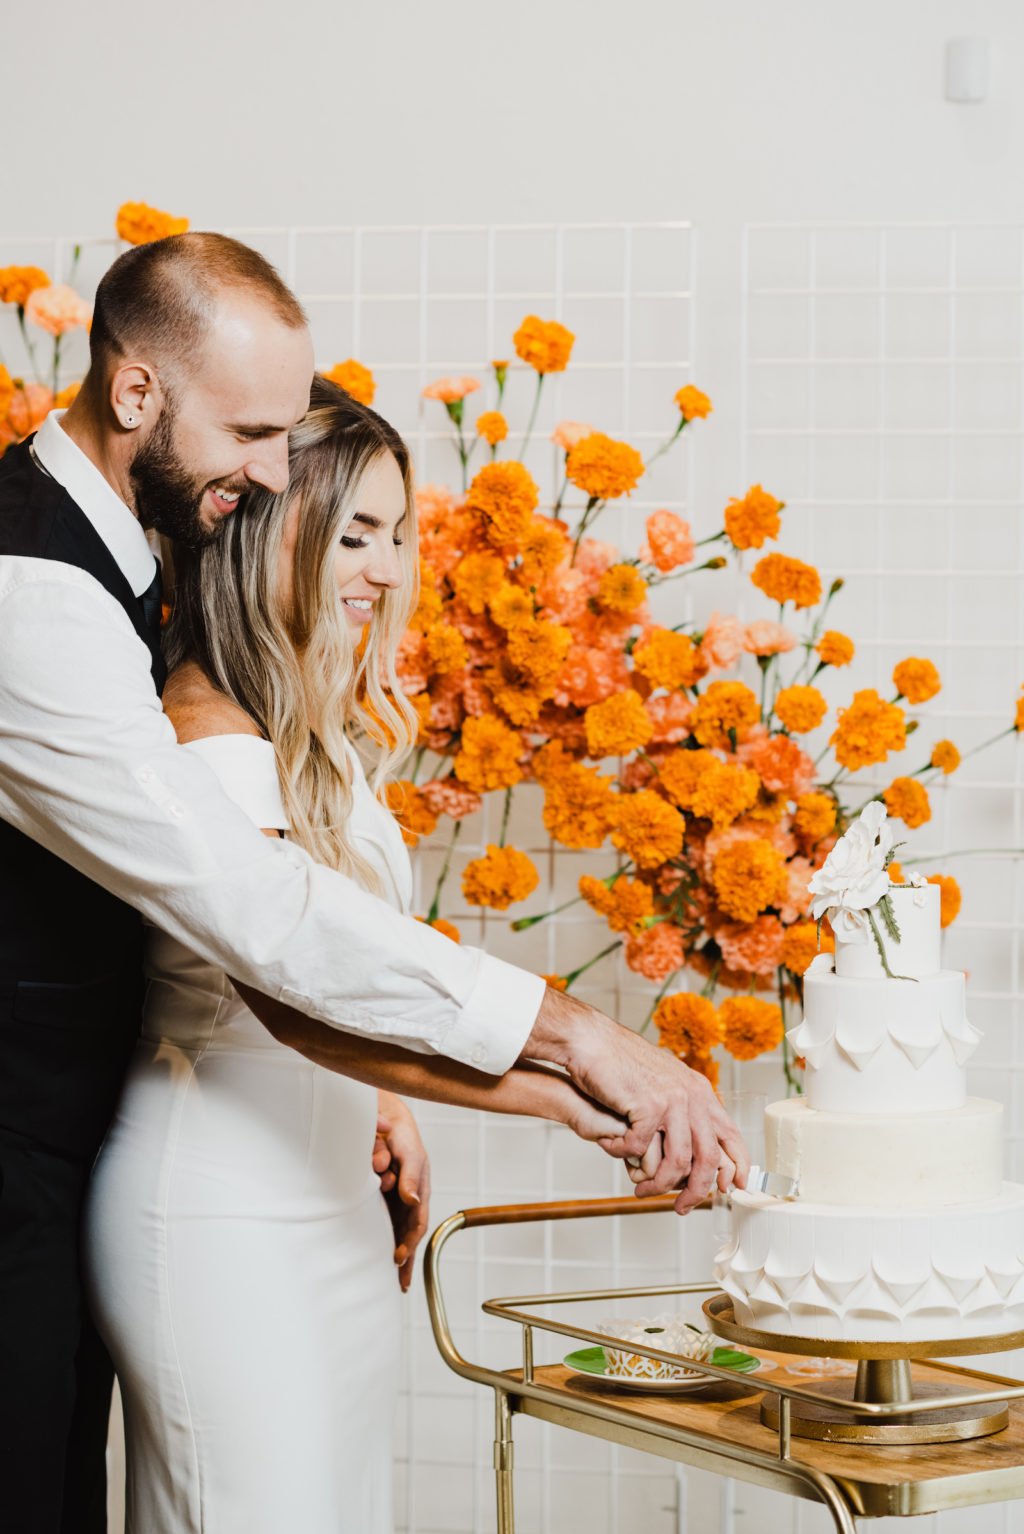 Retro Bride and Groom Cutting Four Tier White Wedding Cake on Bar Cart, Orange Marigolds